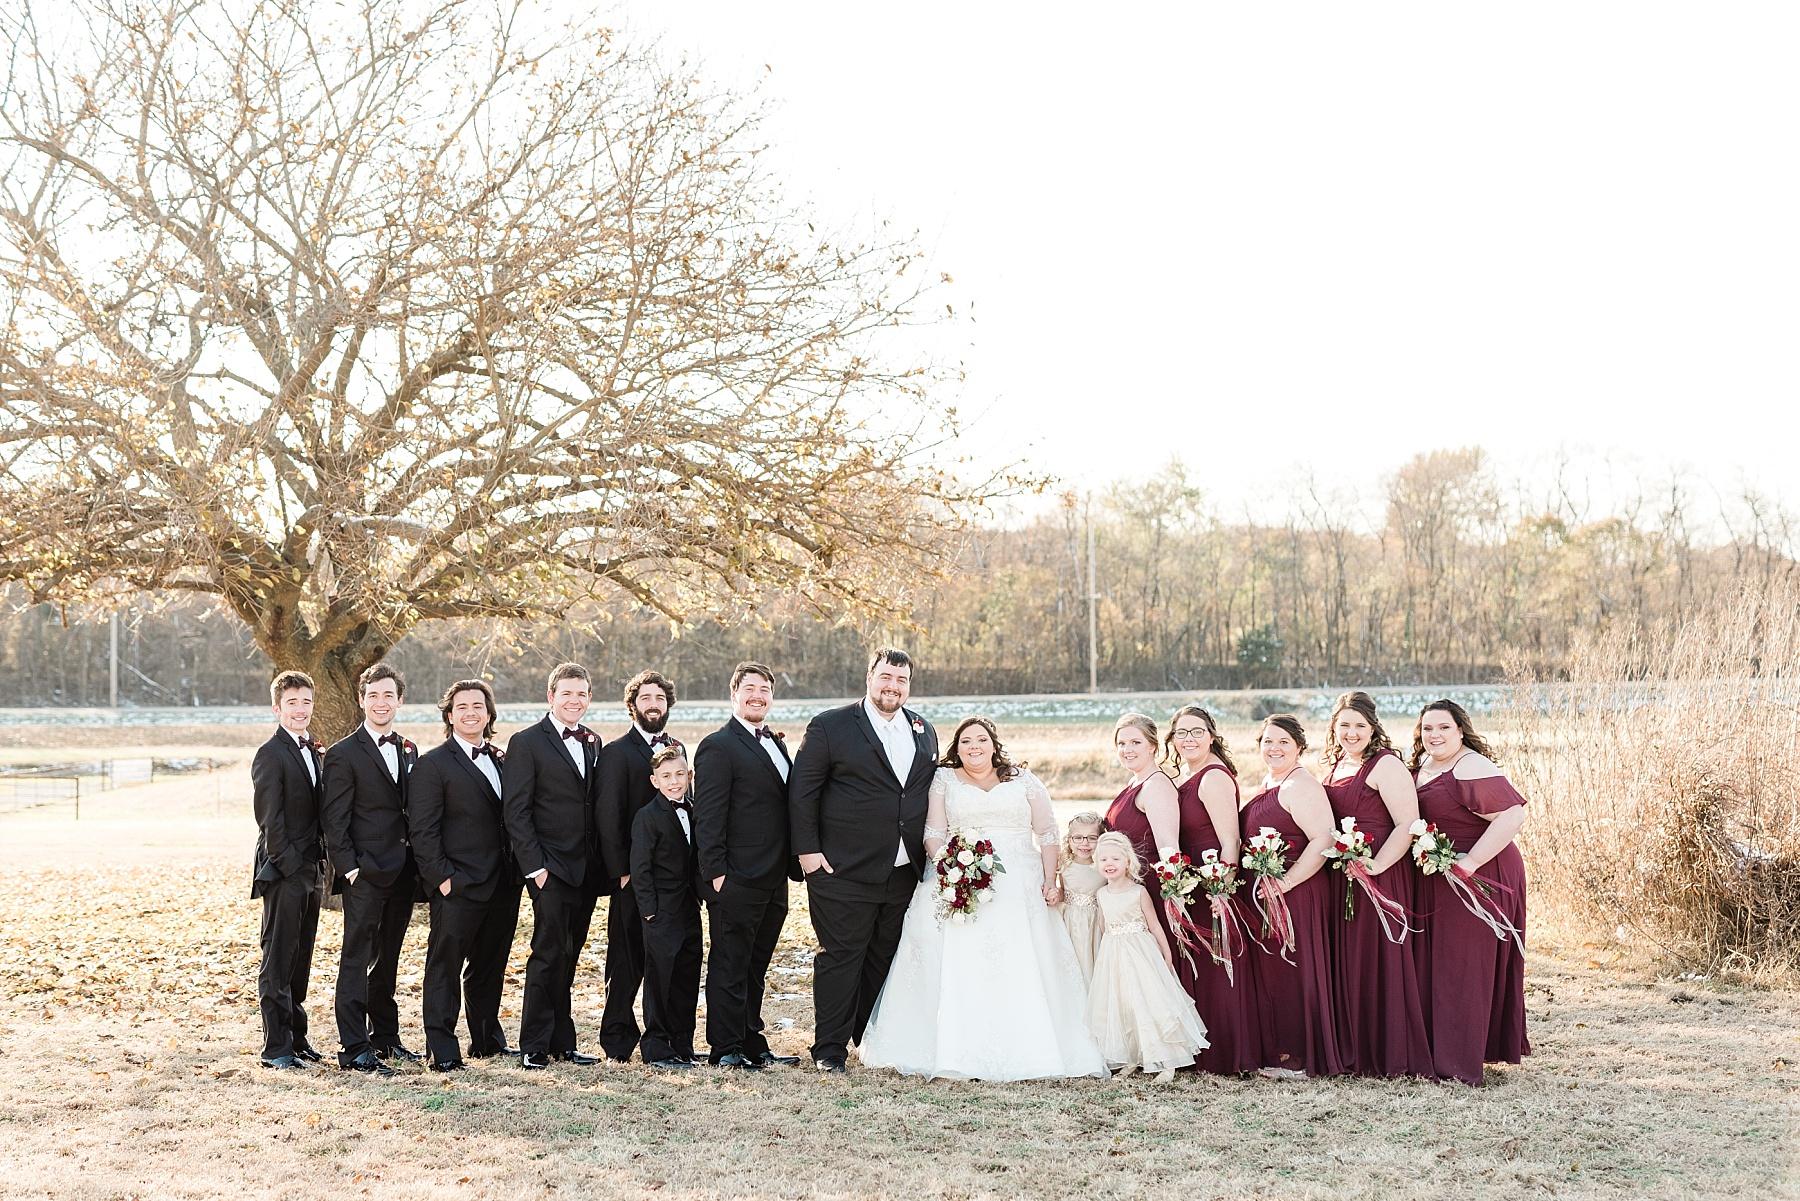 Golden Winter Wedding at The Legacy Barn in Barnett Missouri by Kelsi Kliethermes Photography Columbia Missouri Wedding Photographer_0003.jpg